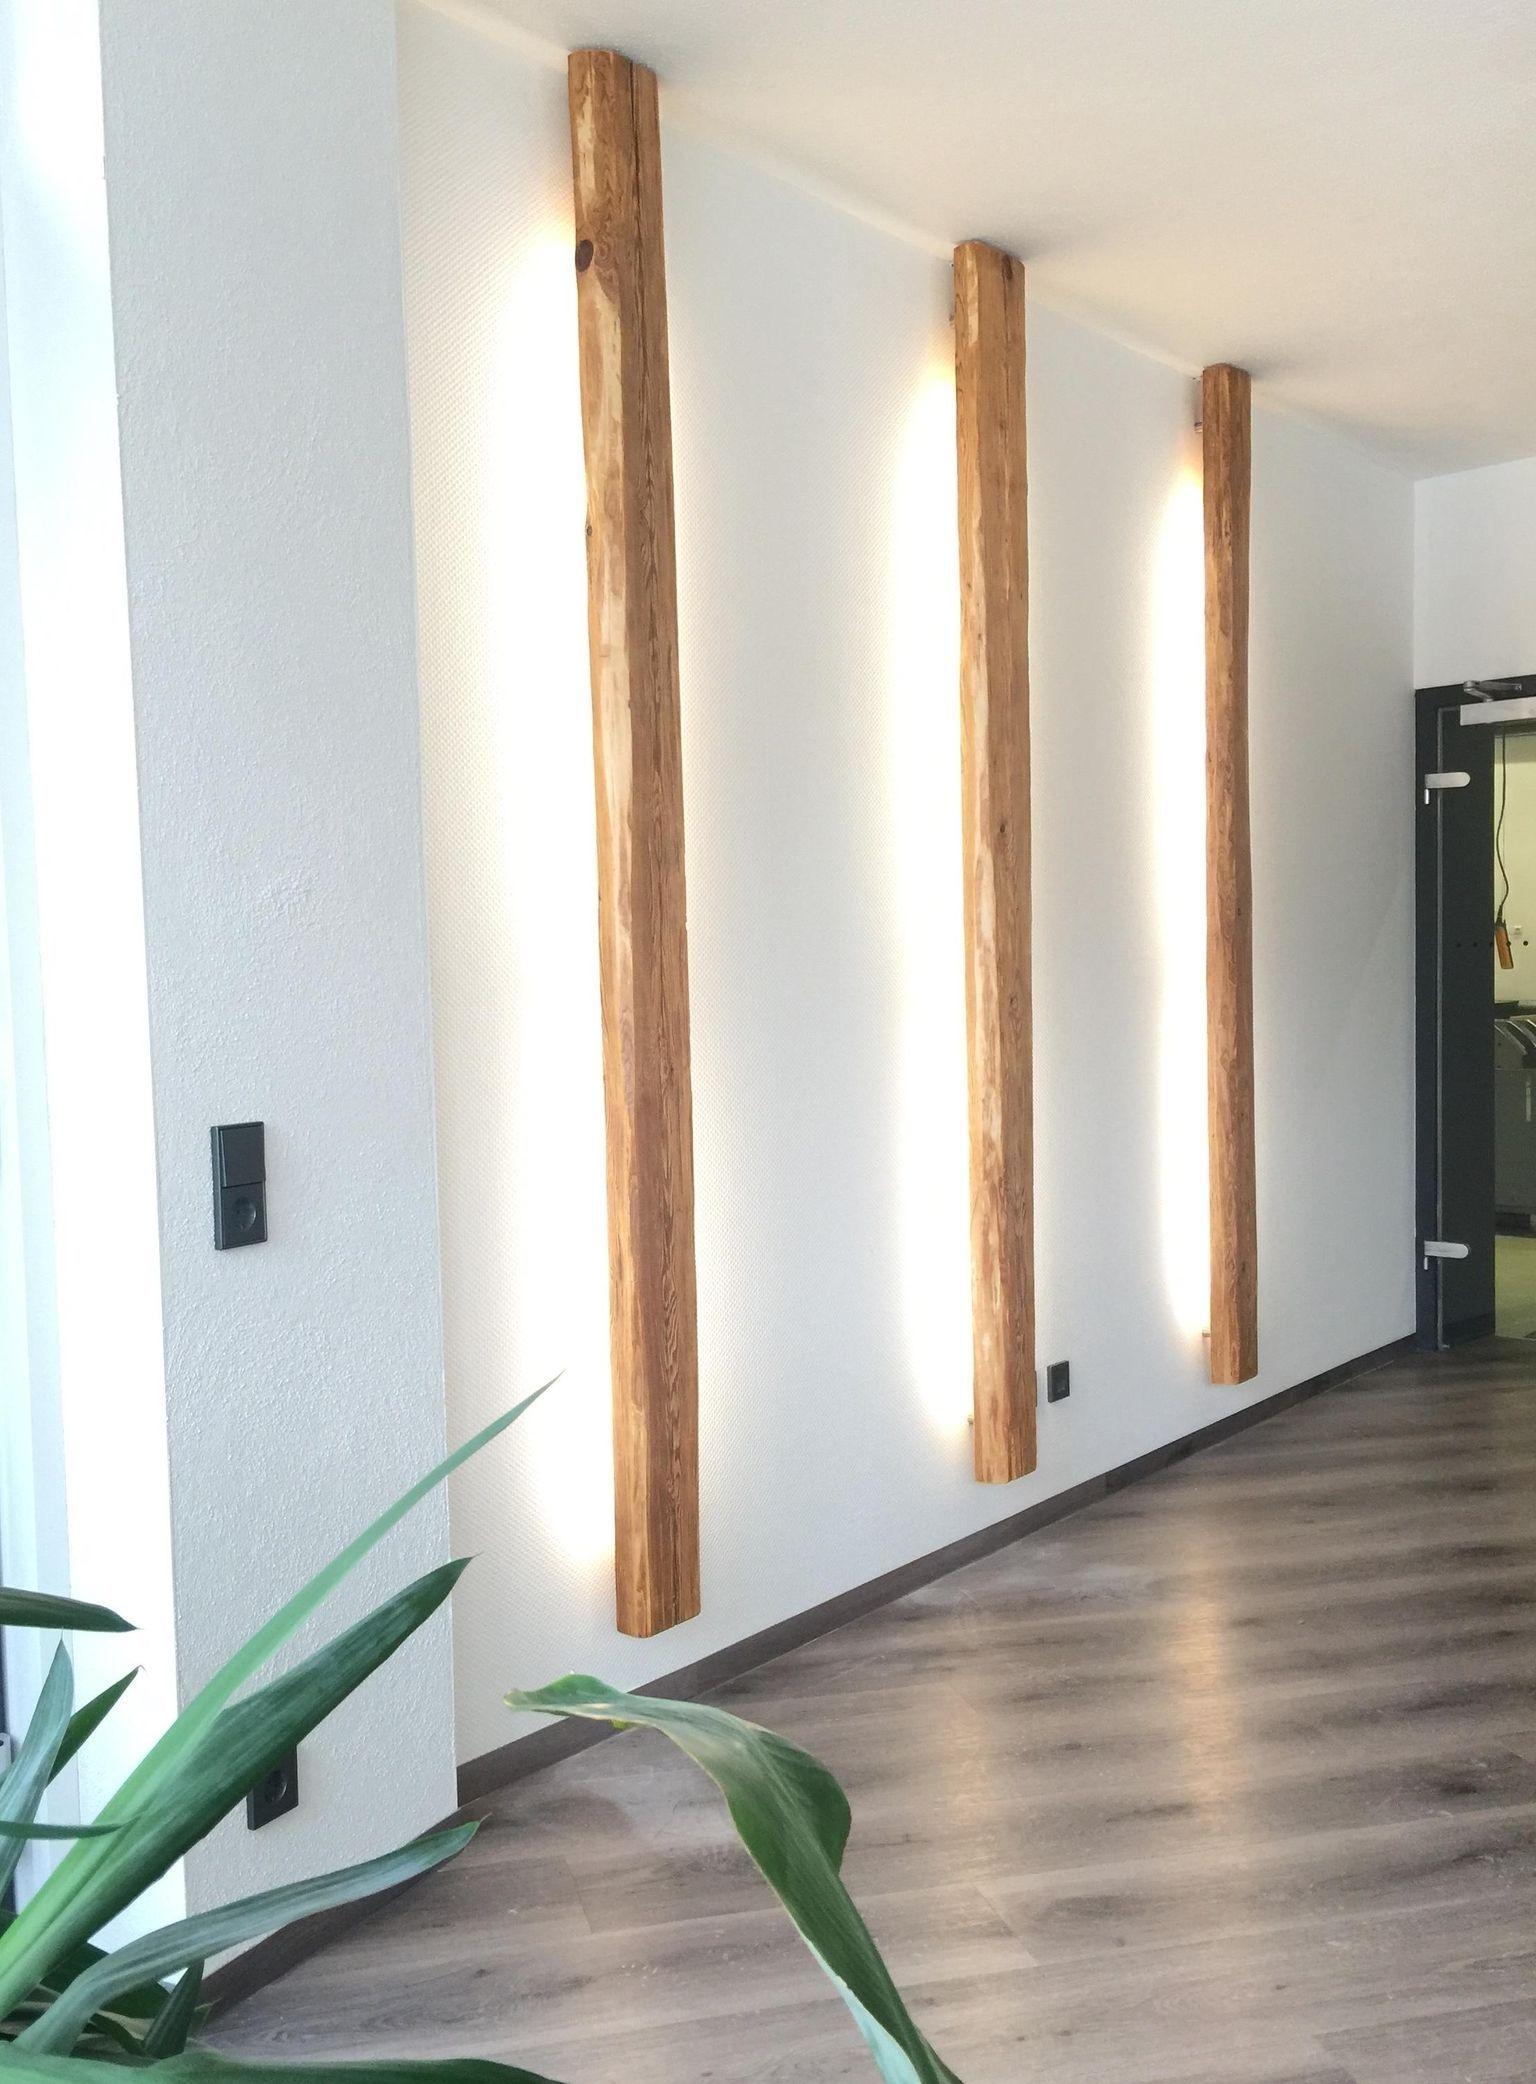 Blickfang Aus Altholz Lampe Living Beleuchtung Licht Light Lightingforhomes Lamps Home Interior Design Diy Home Decor Decor